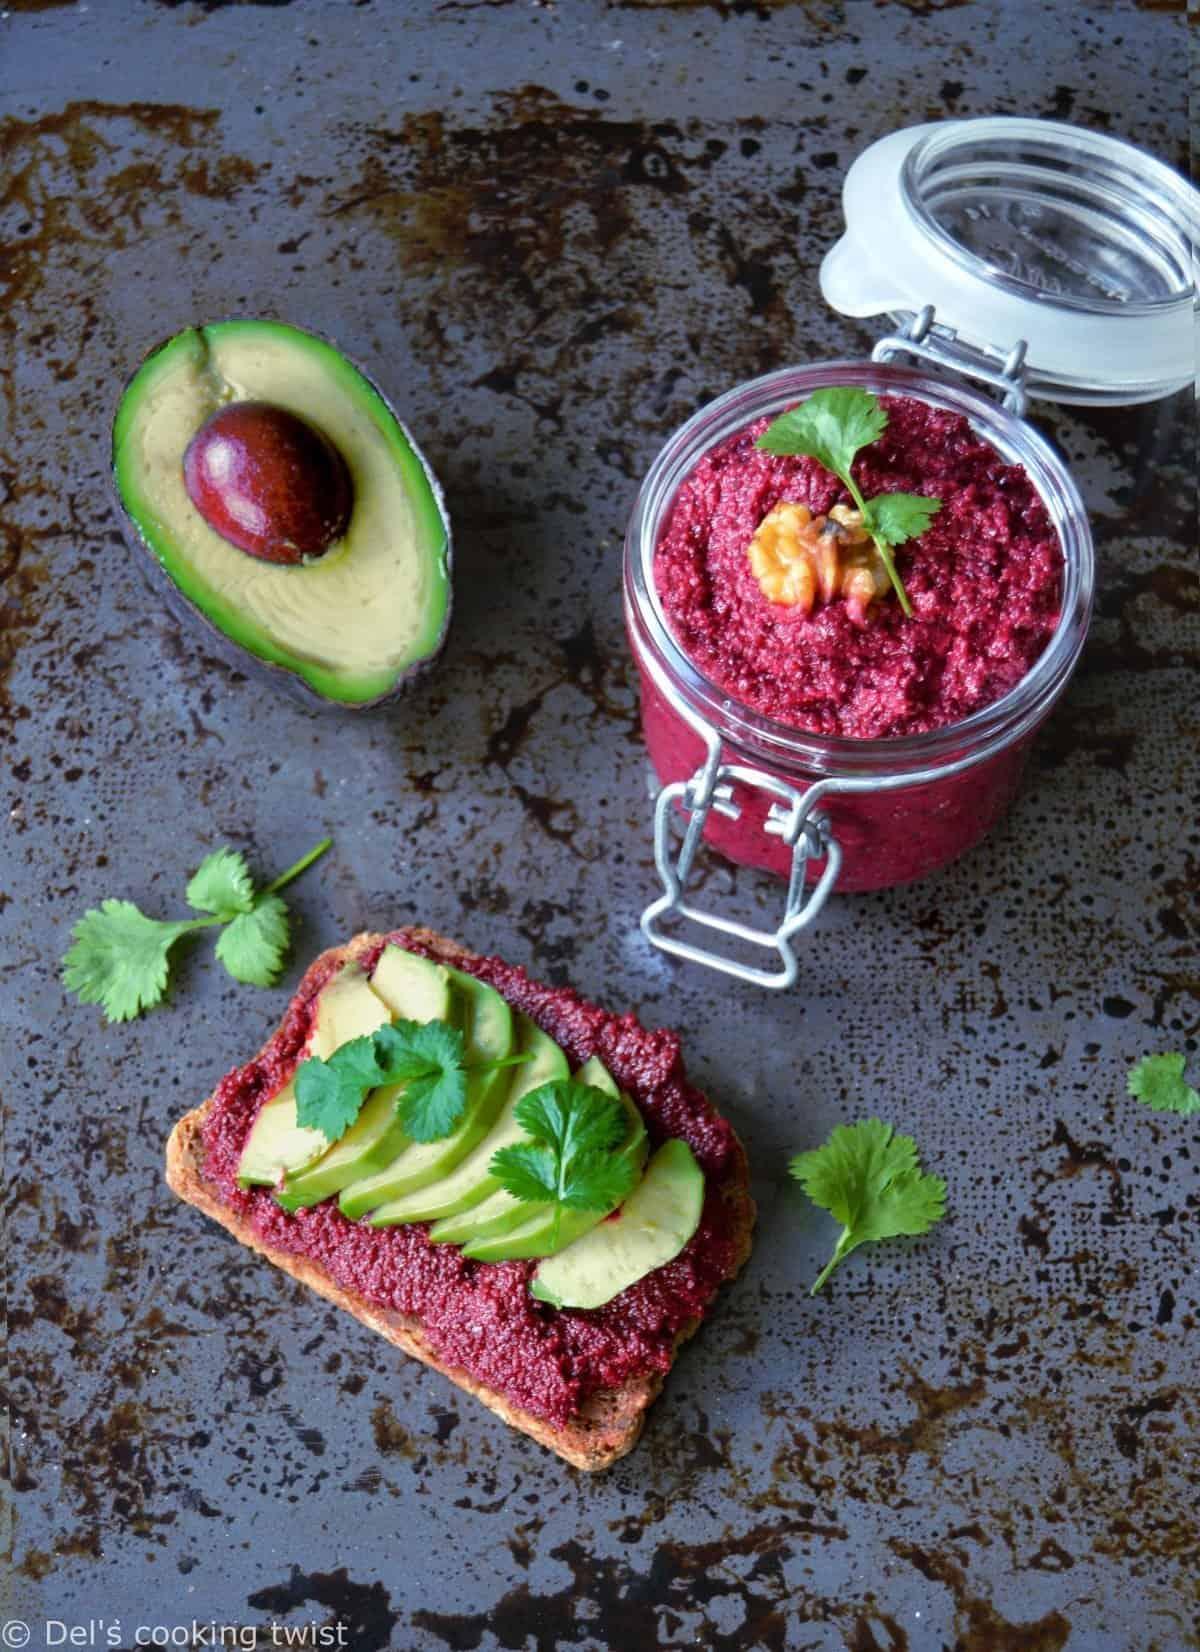 Vegan Avocado Toast with Beet Hummus